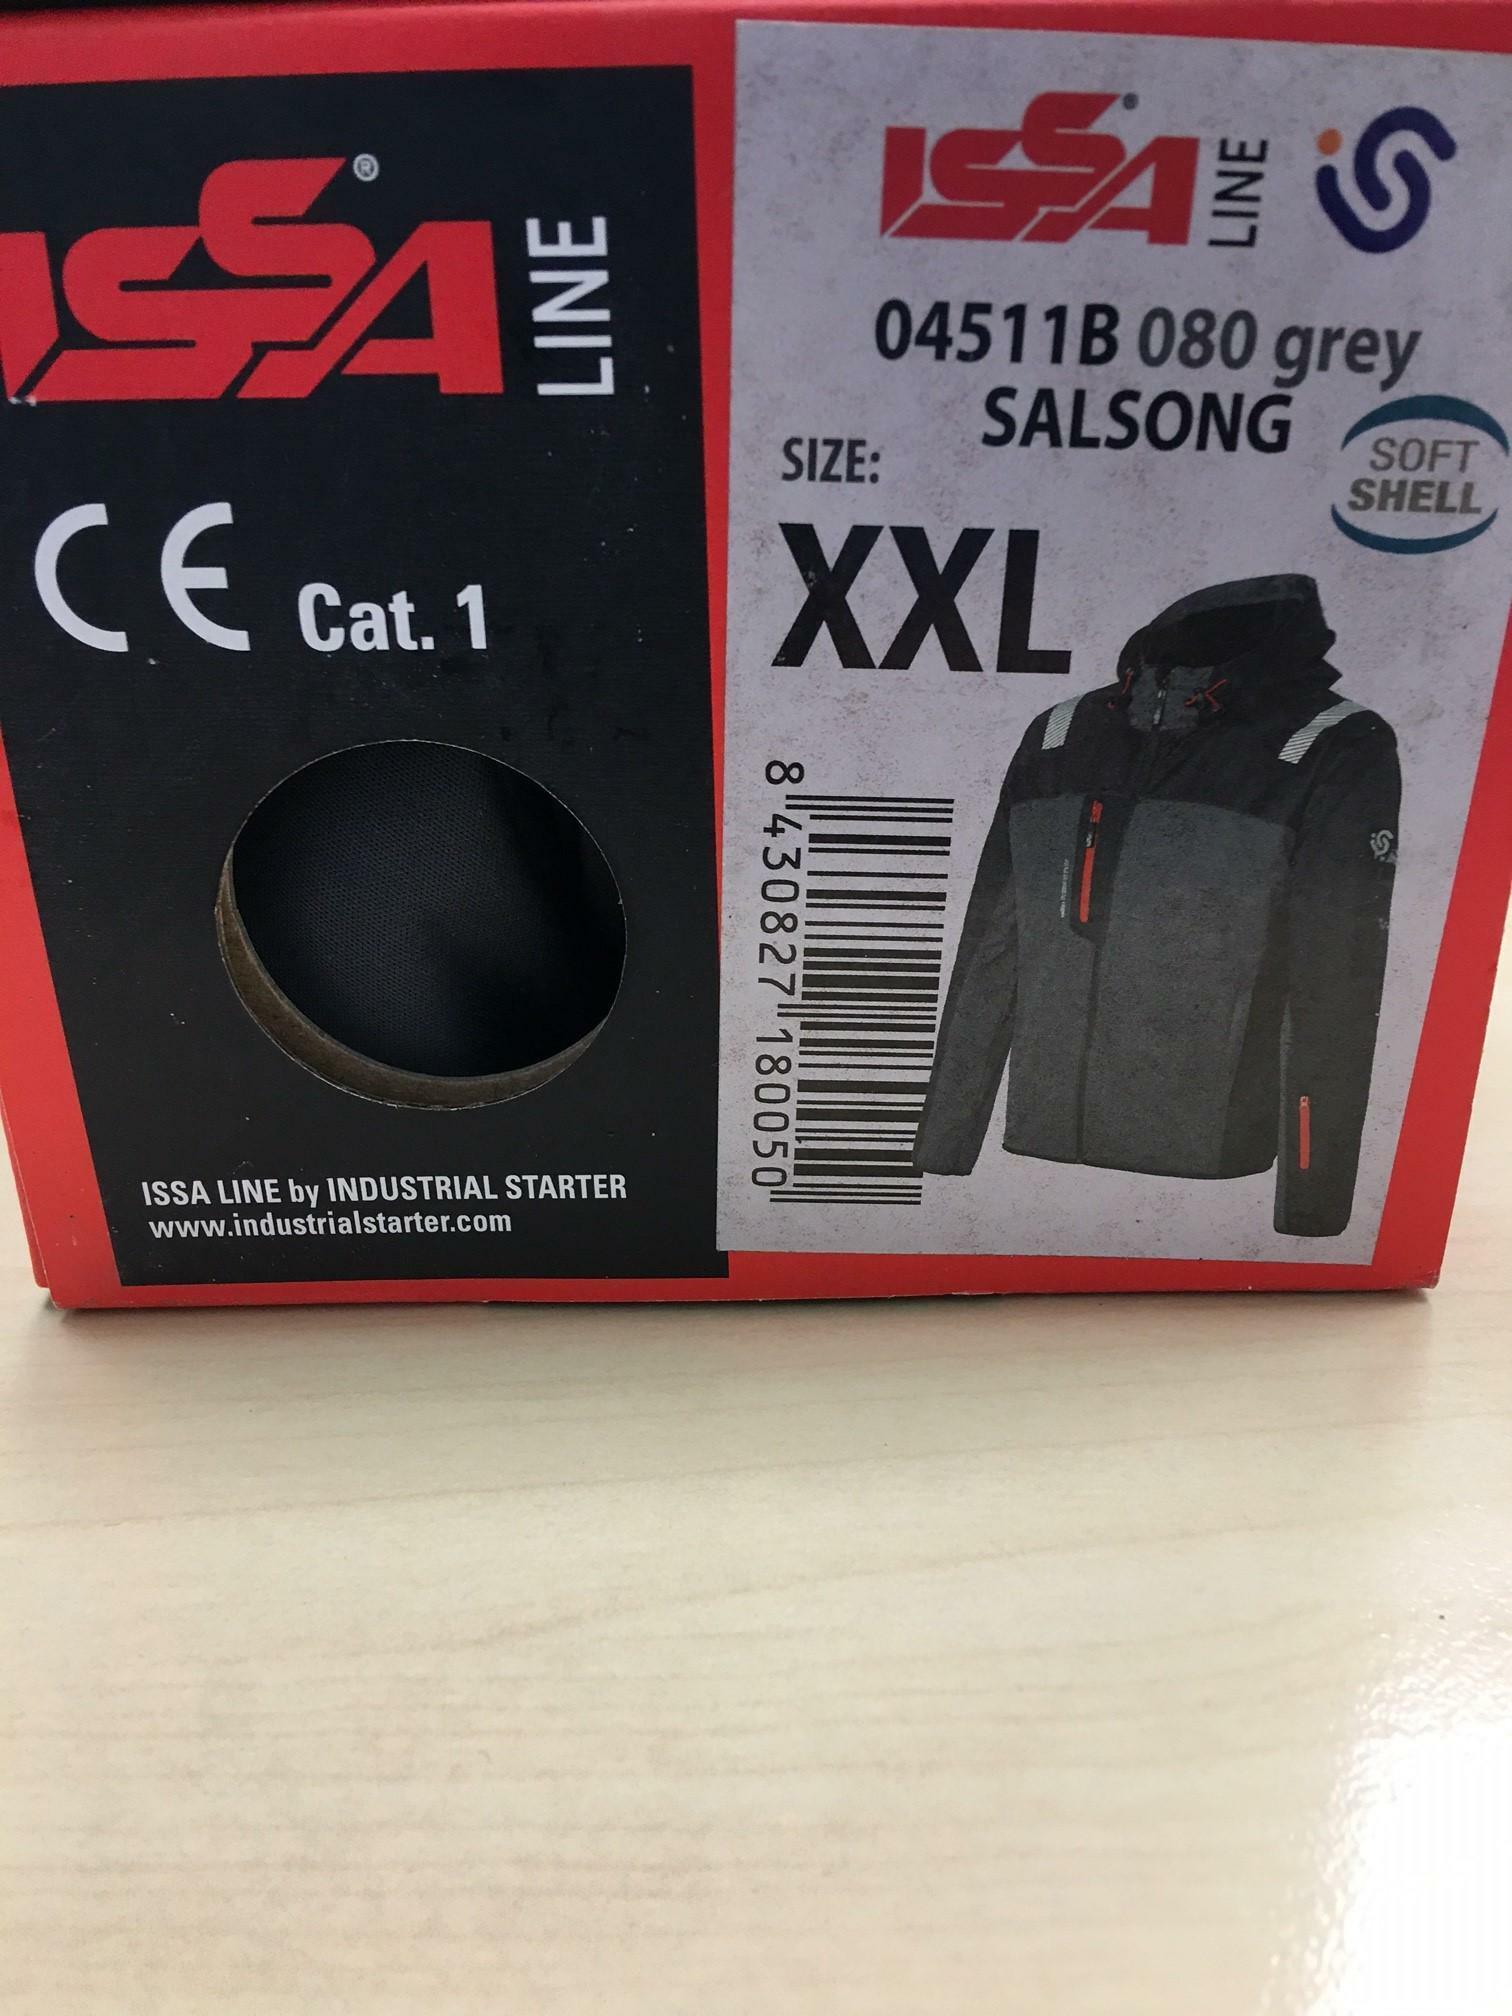 industrial starter giubbino salsong grigio taglia xxl cod.04511 080